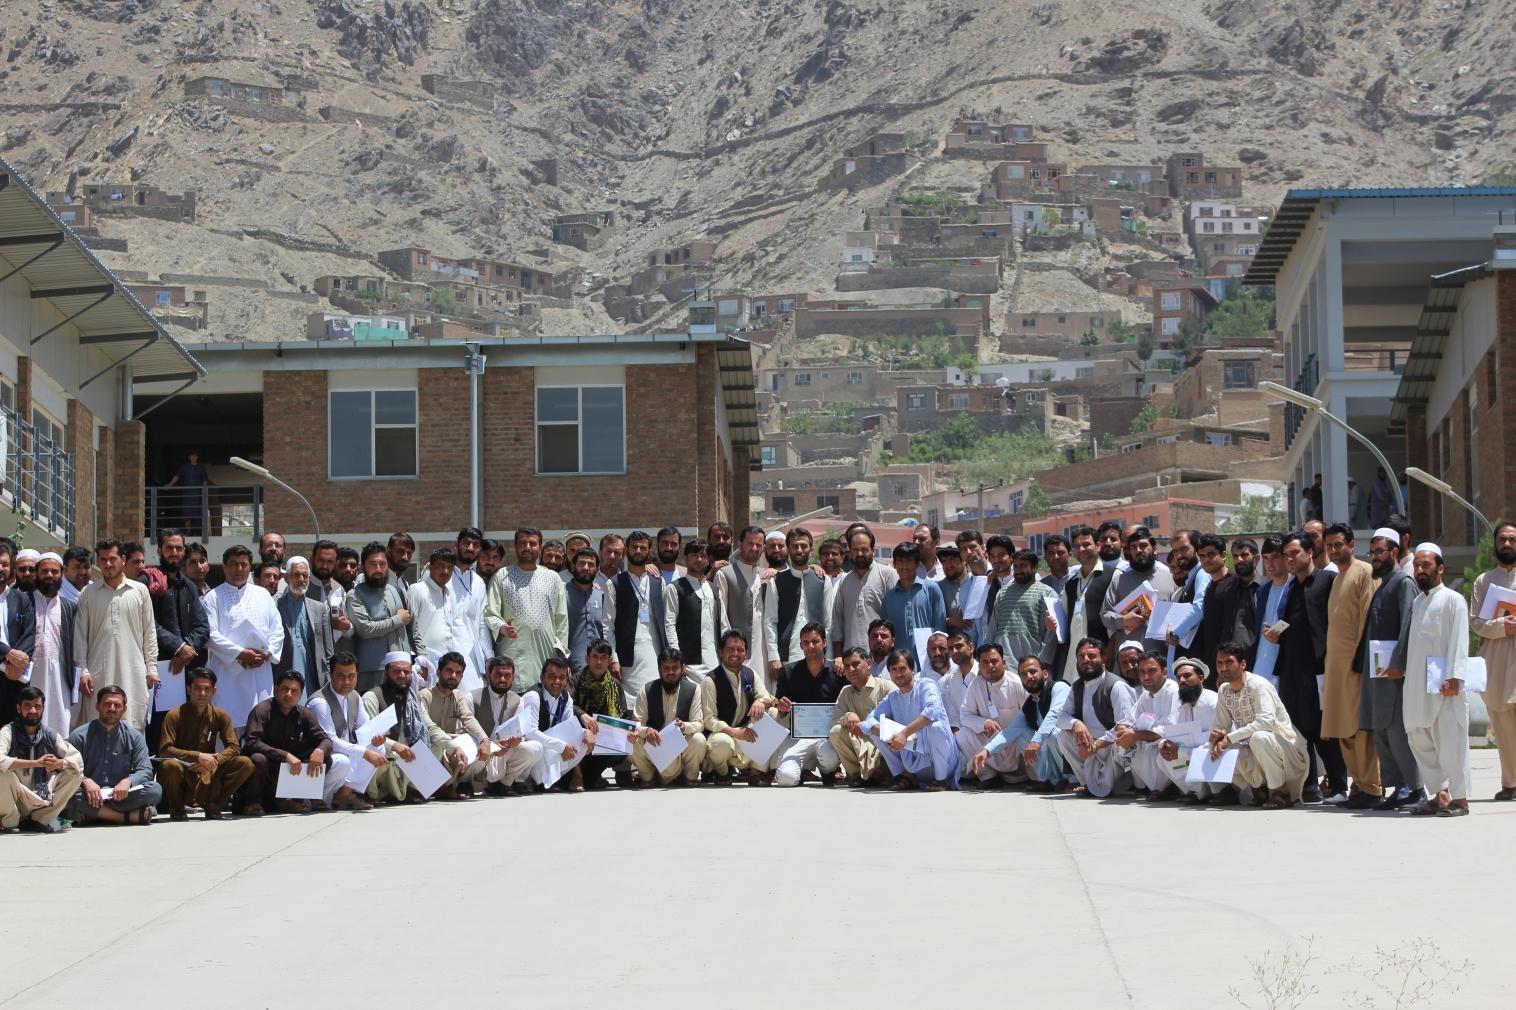 Lerarenopleiding WUR in Kabul weer open